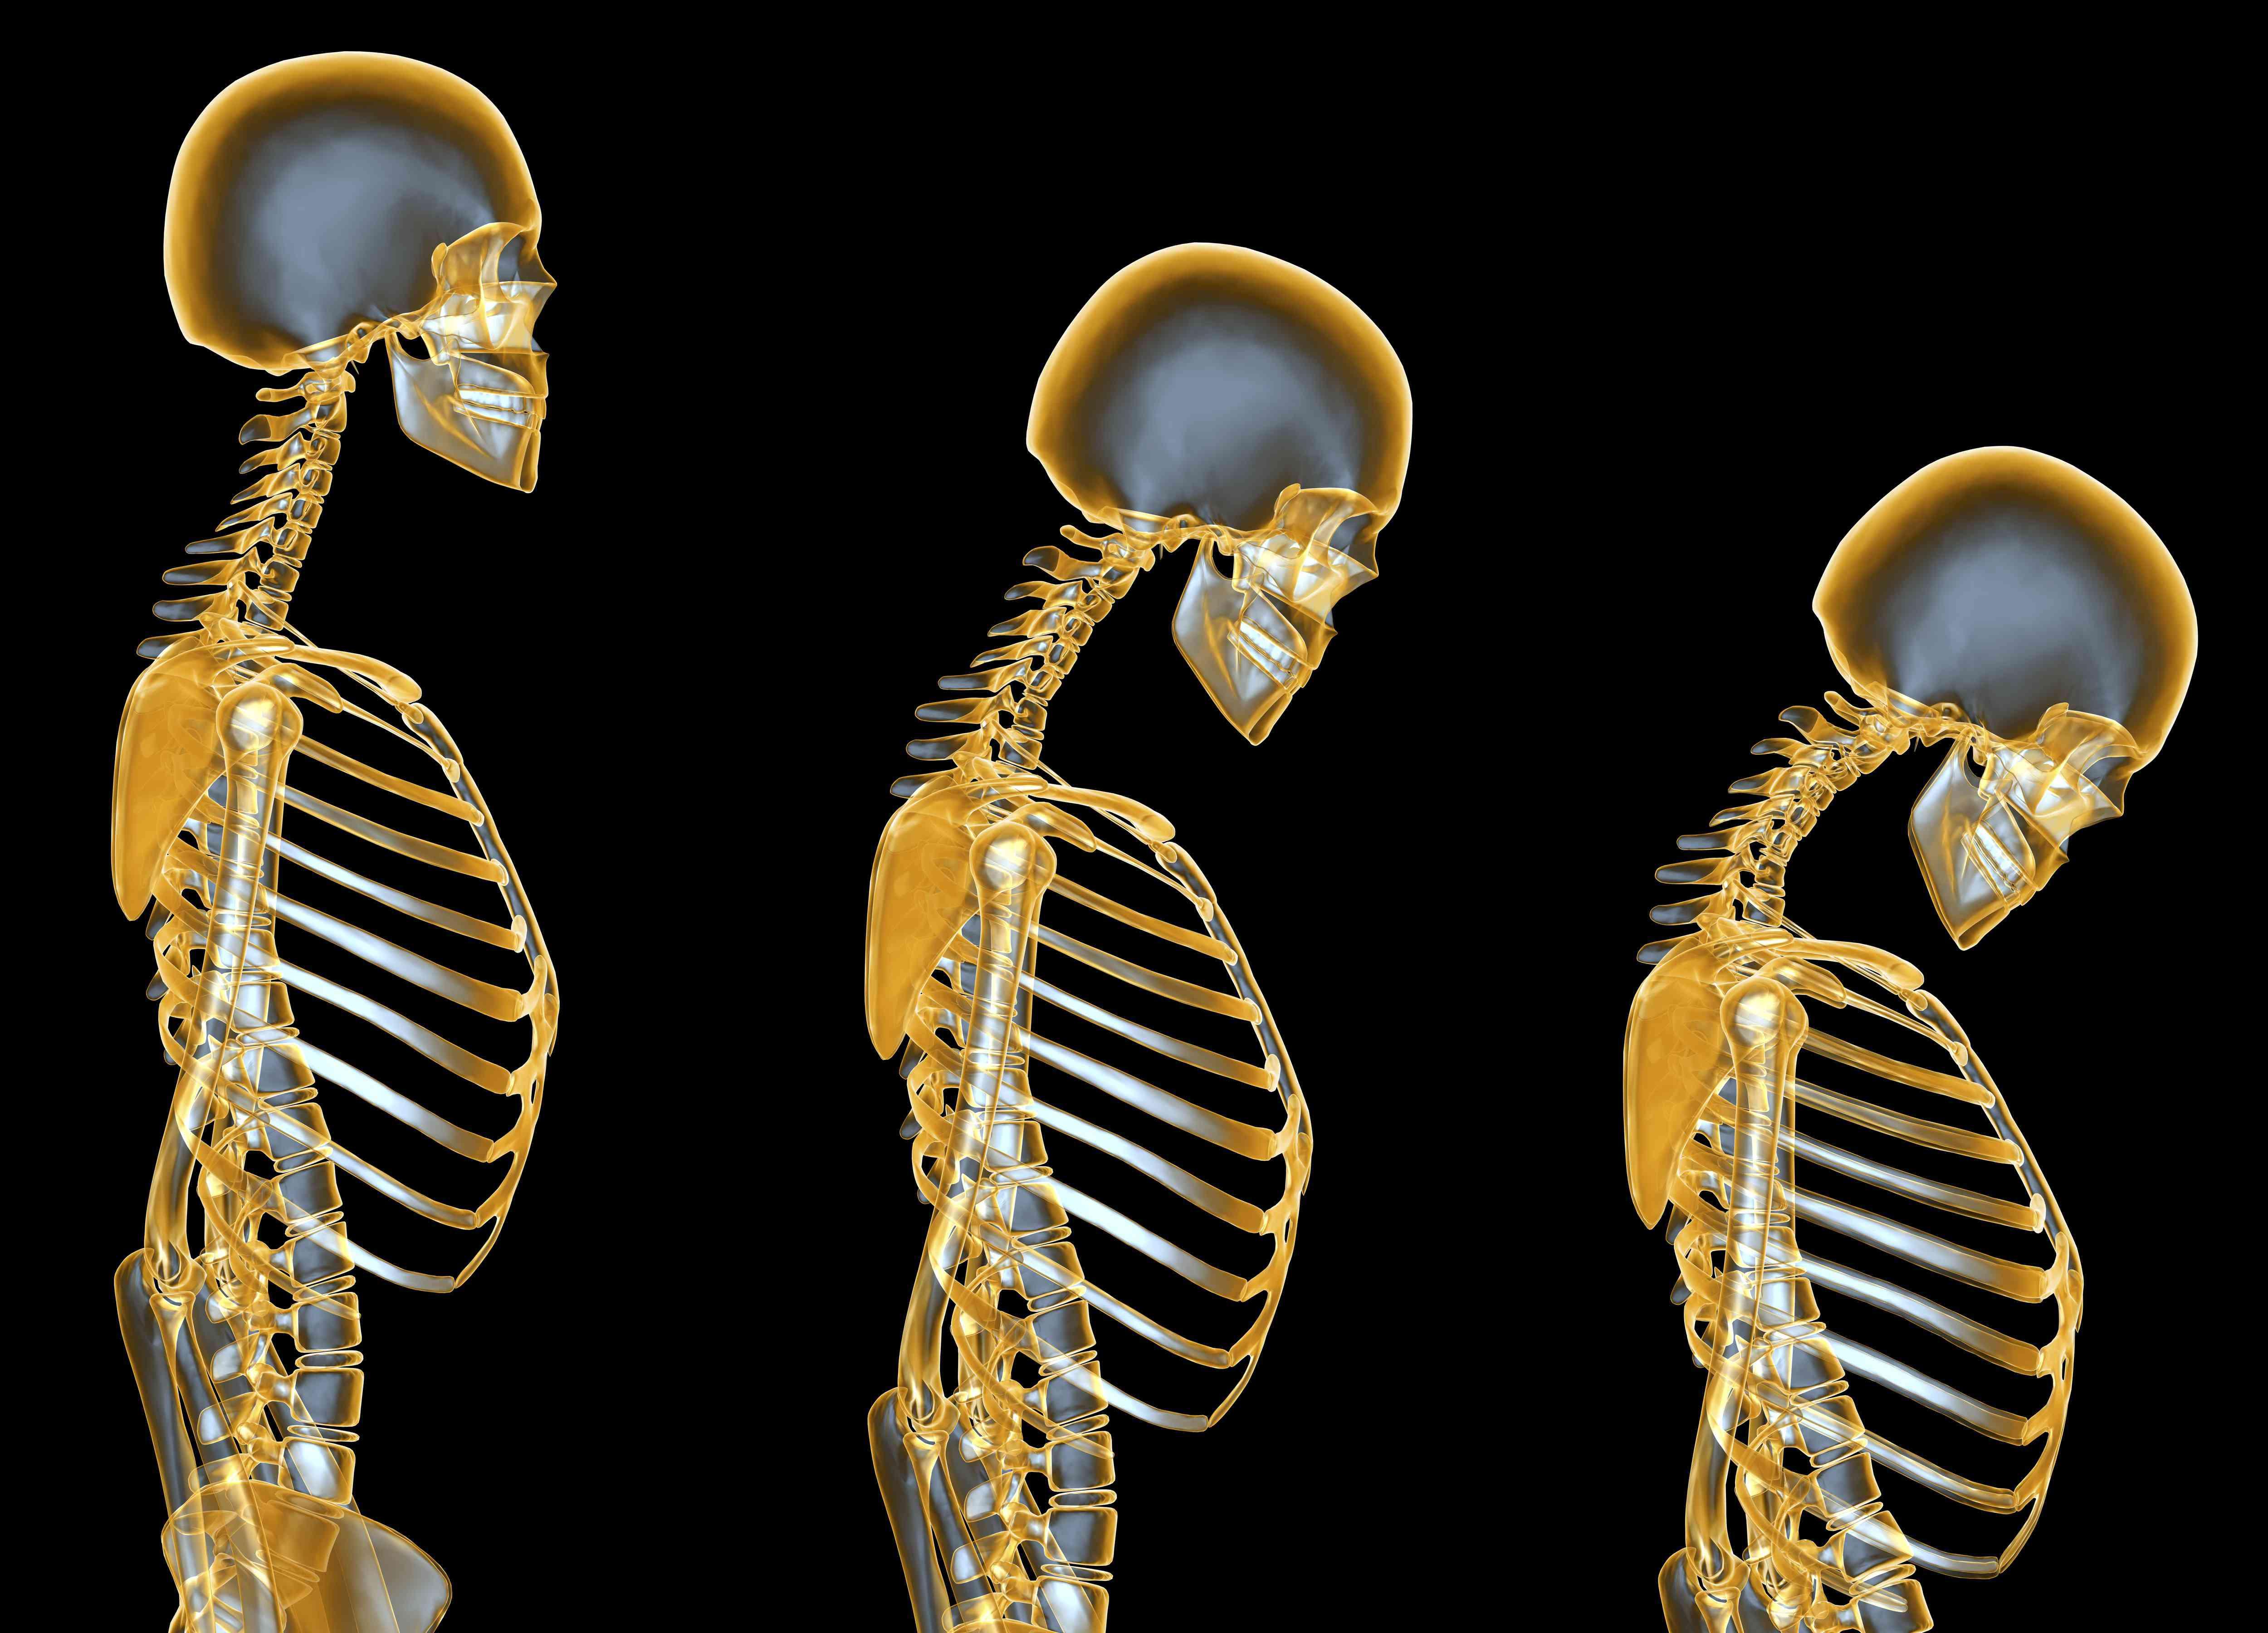 X-ray illustration of Osteoporosis progression